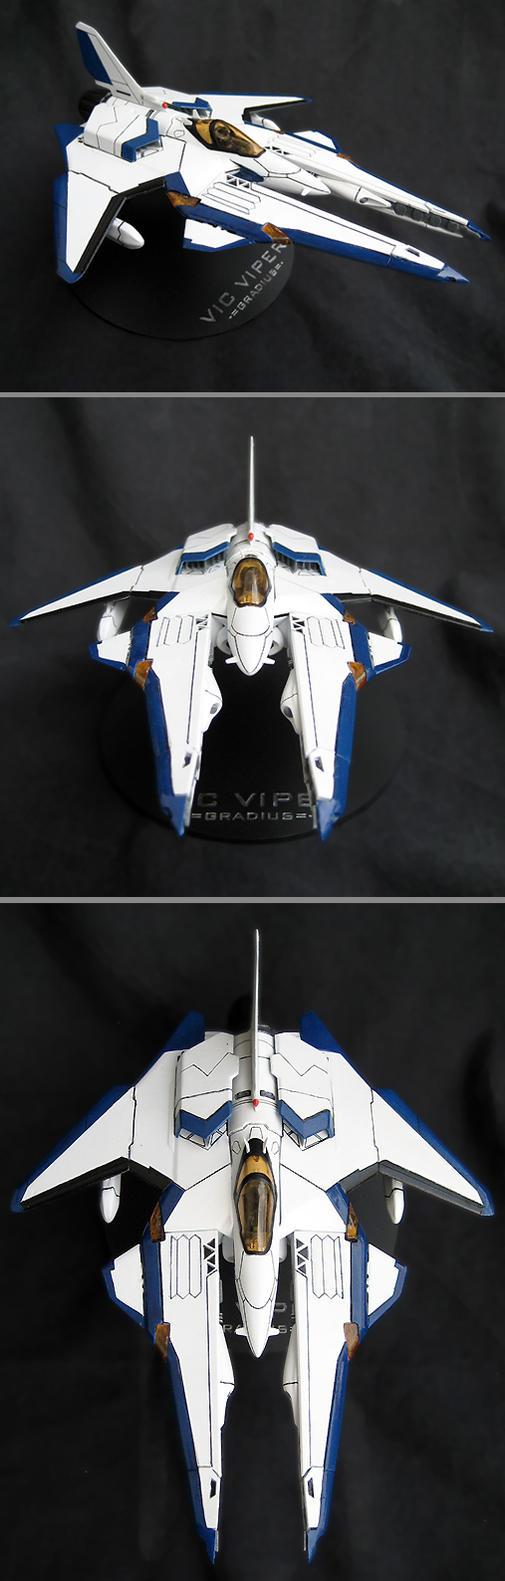 Gradius: Vic Viper Model by shadowvfx